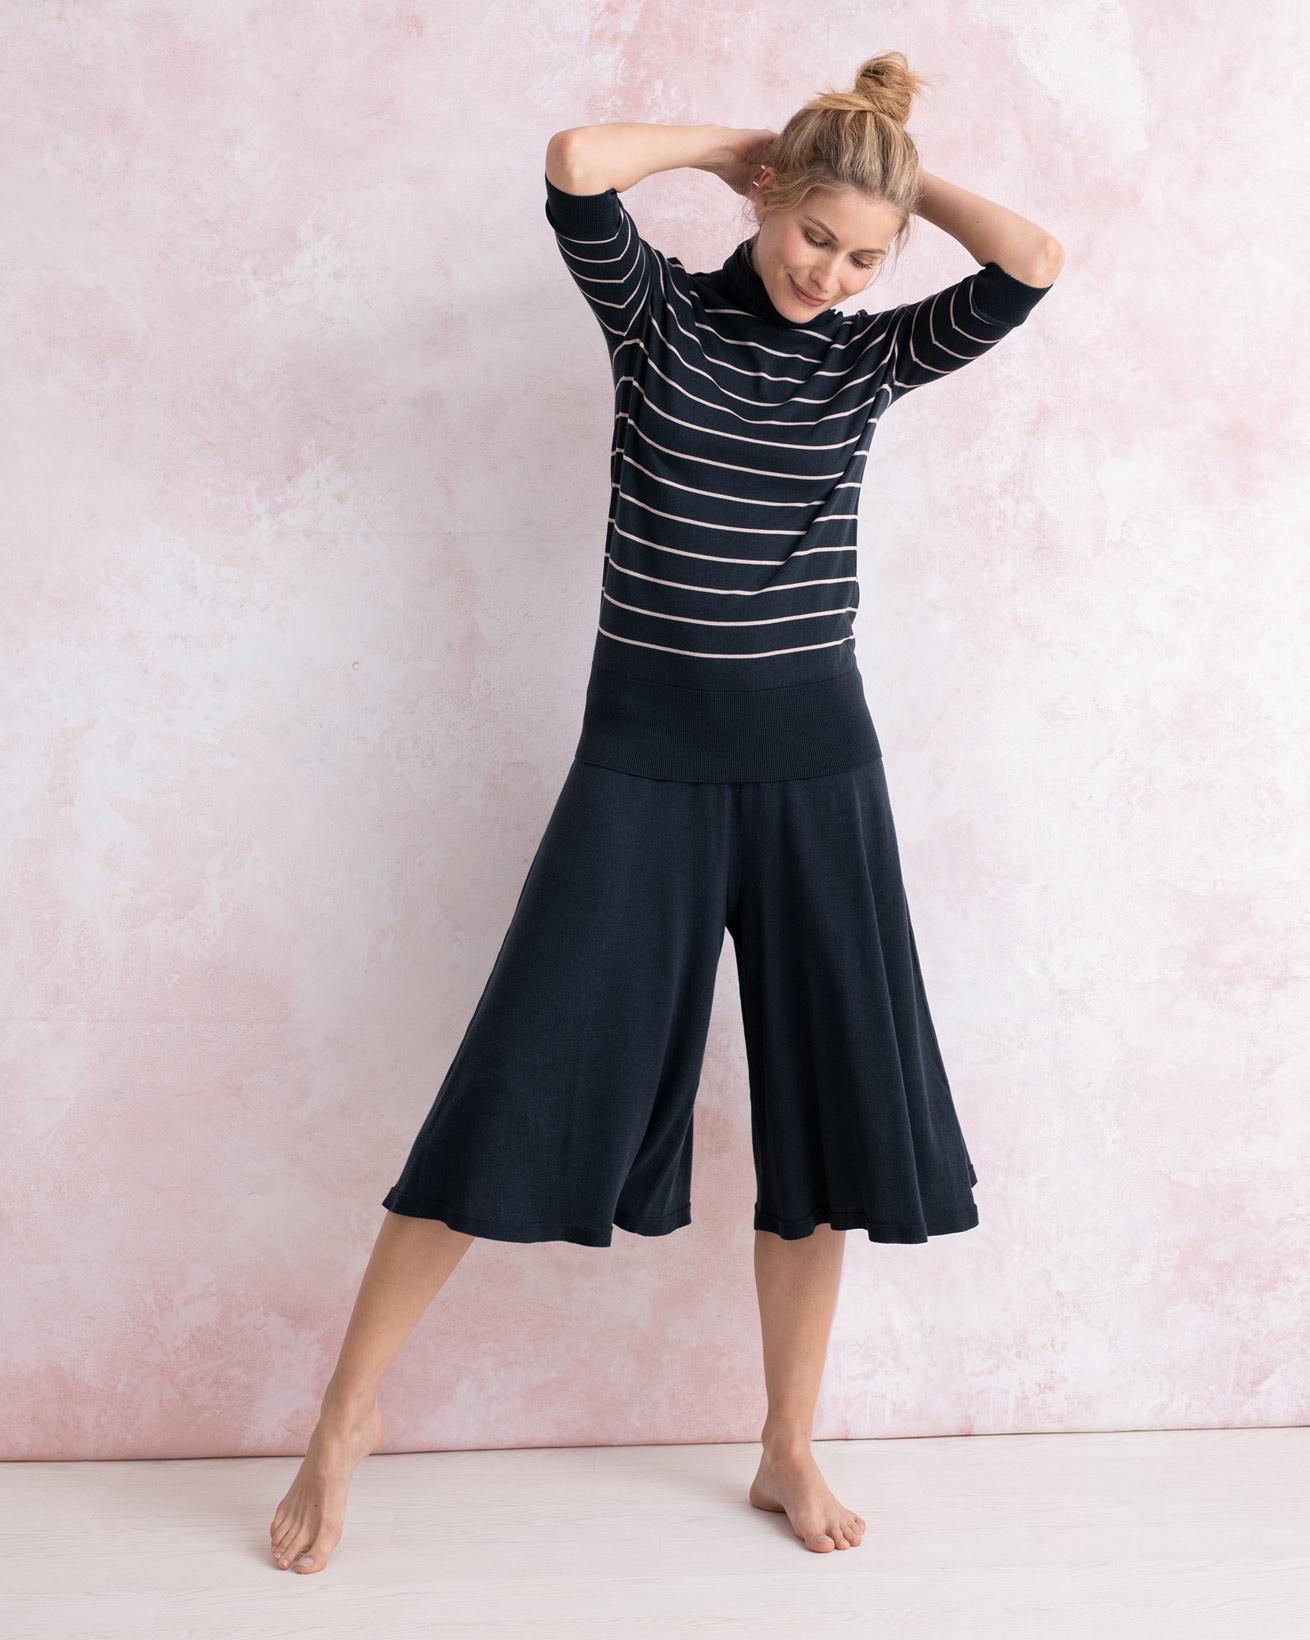 7672-eco-cotton-culottes-87-lfs.jpg